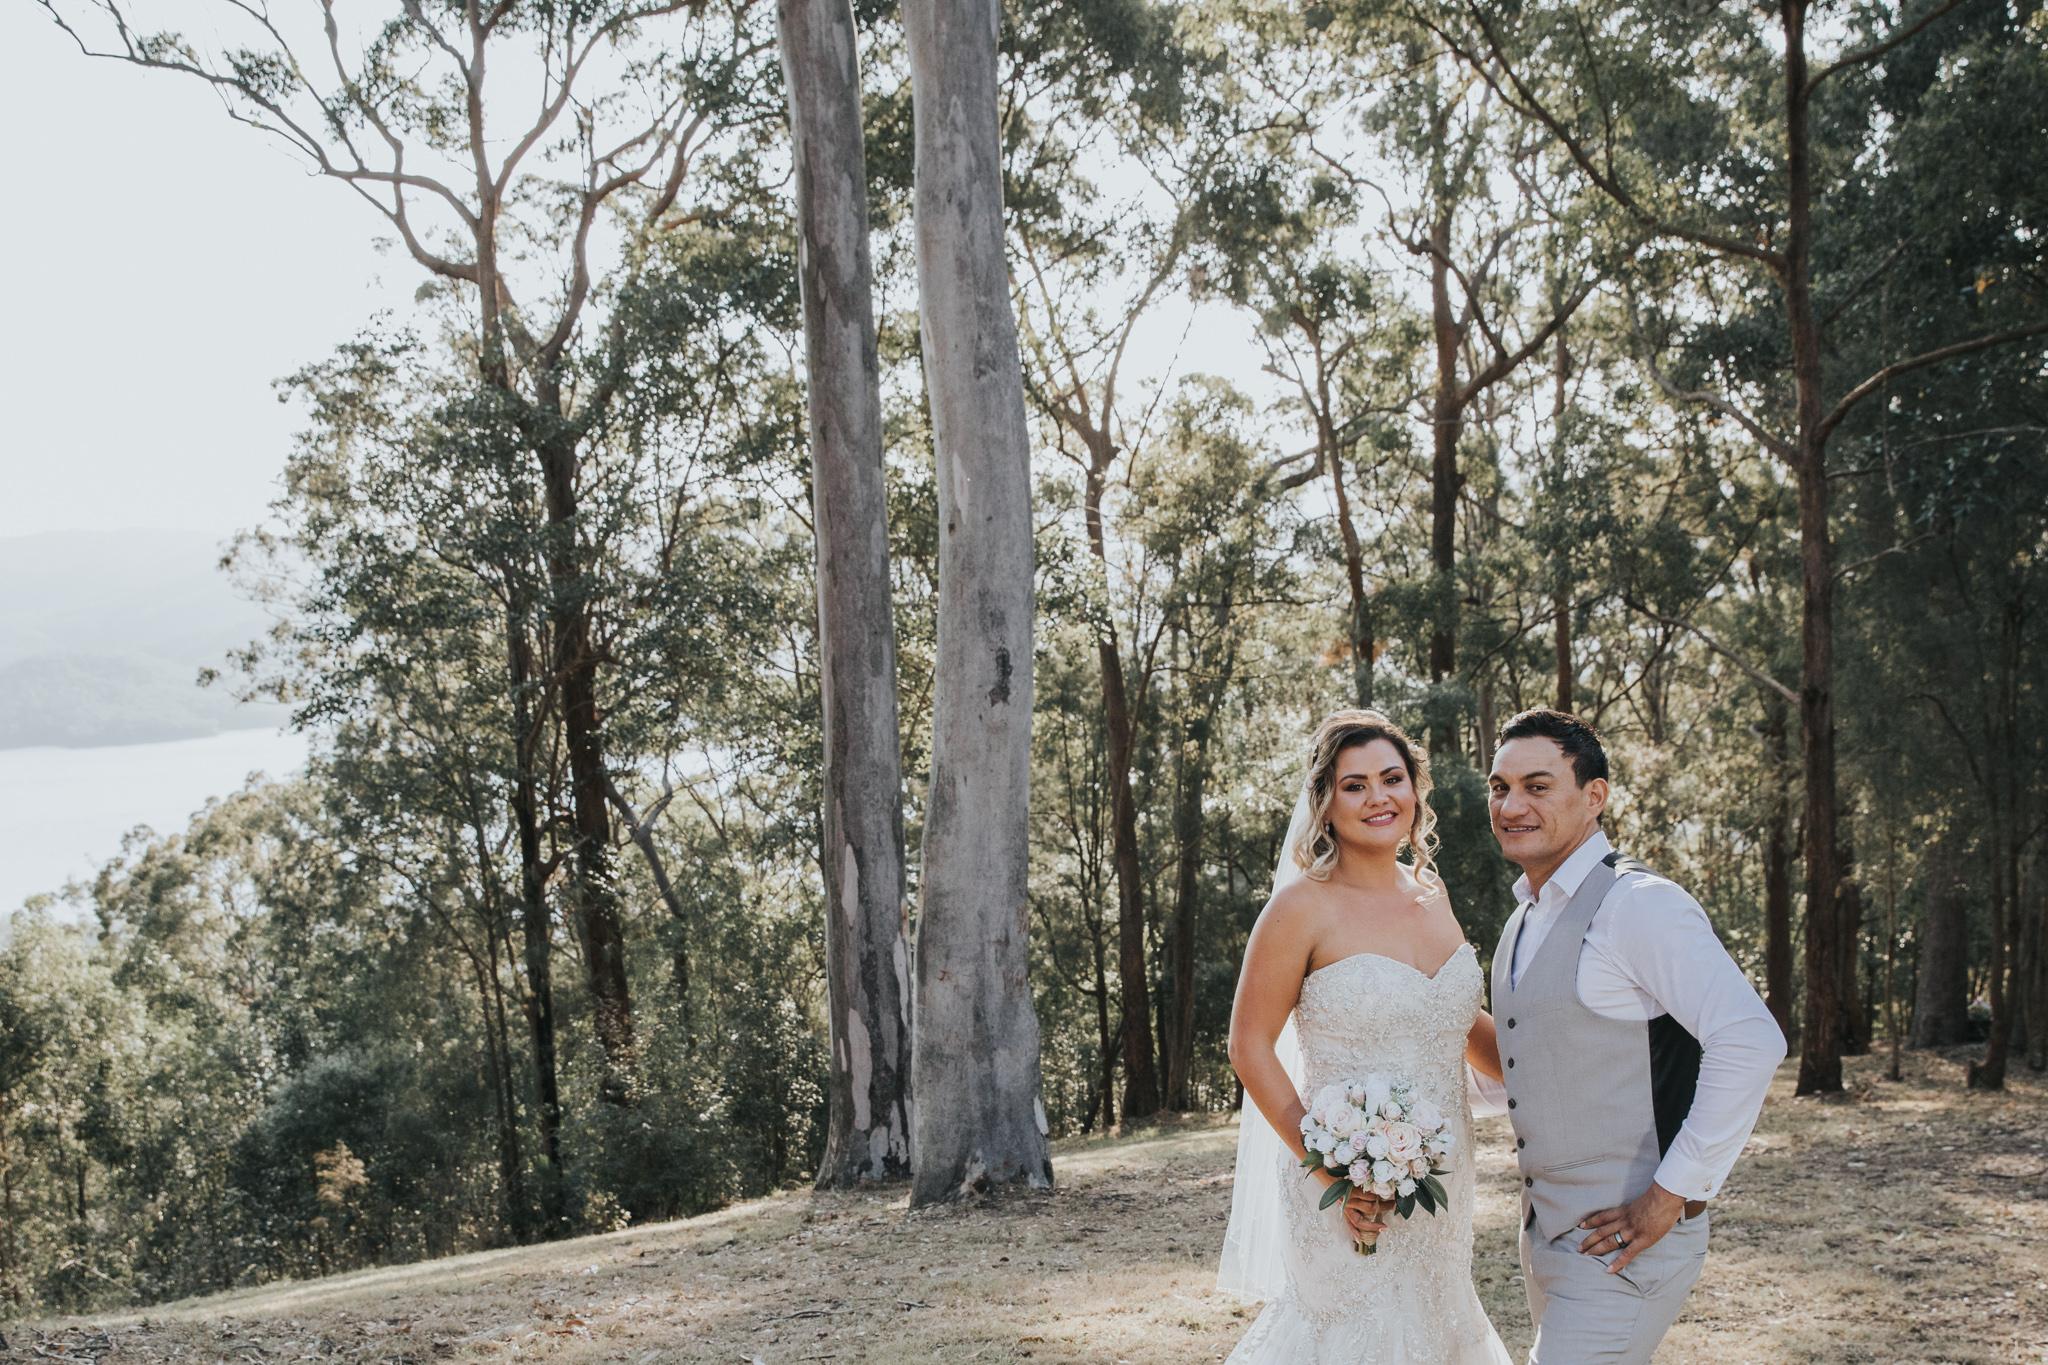 KAHLA + JOHNNY - The Panaorama, Gold Coast Hinterland